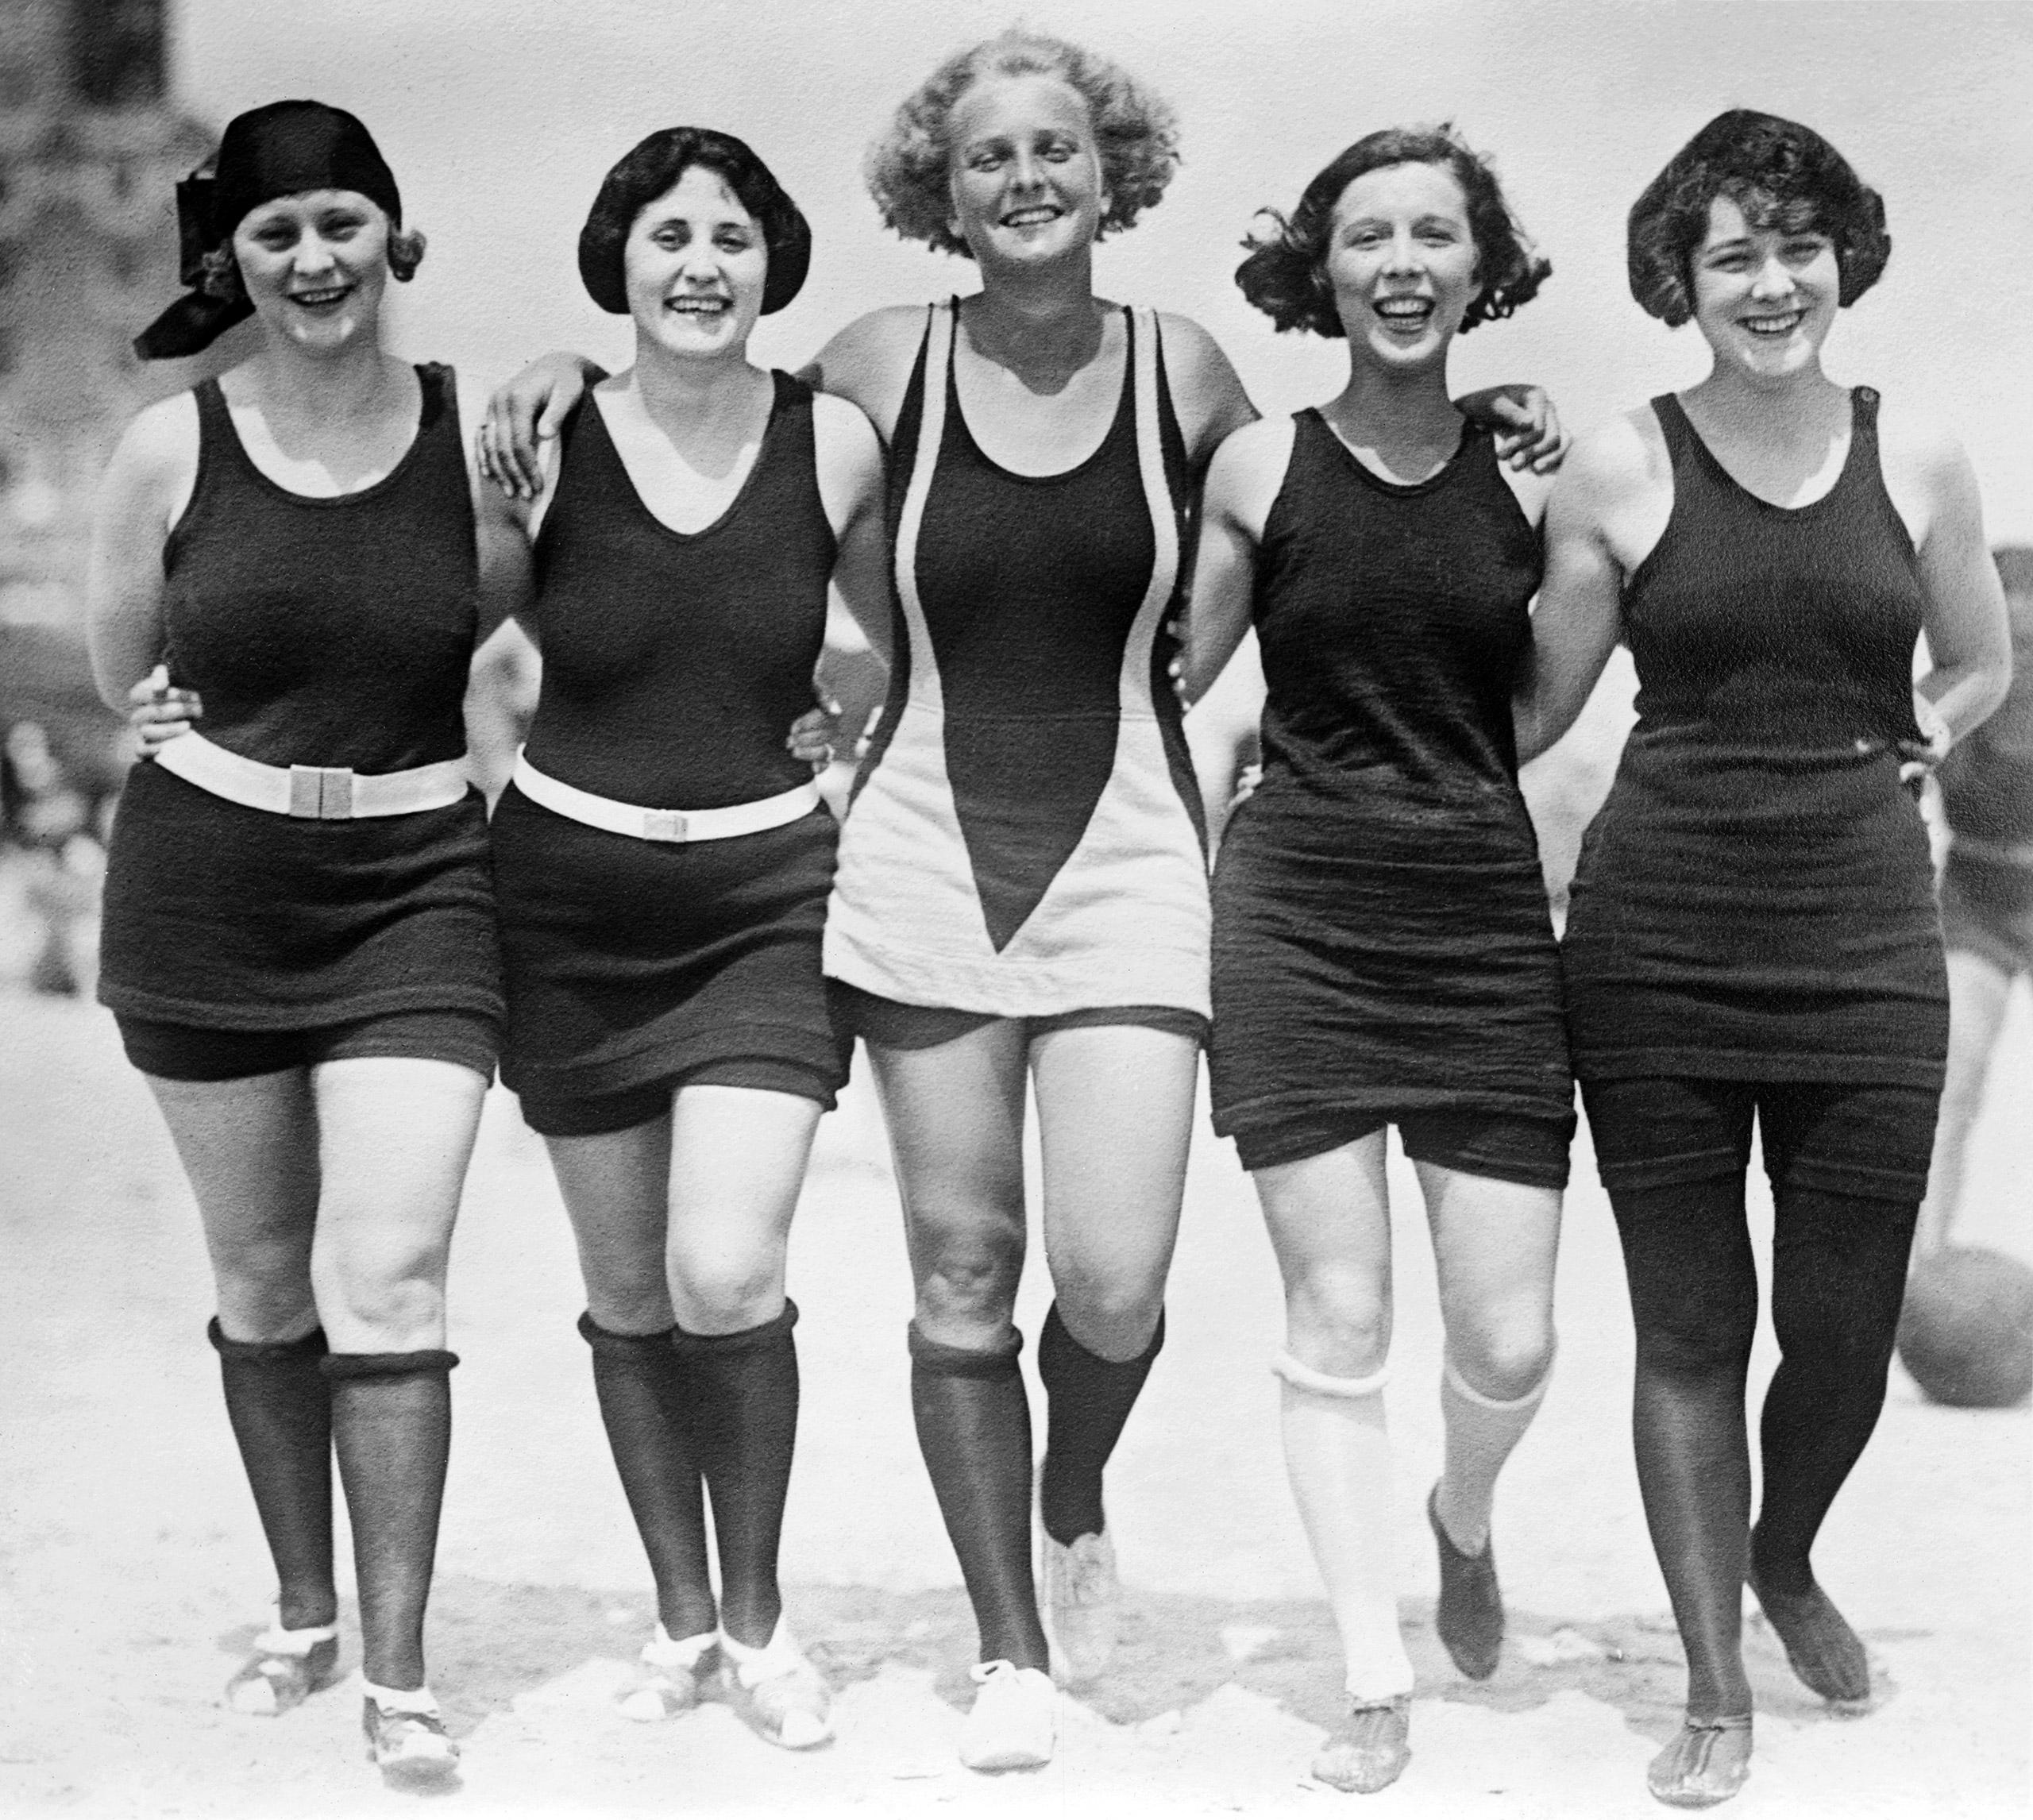 Five women walking arm-in-arm on the beach wearing wool bathing suits, circa 1925.